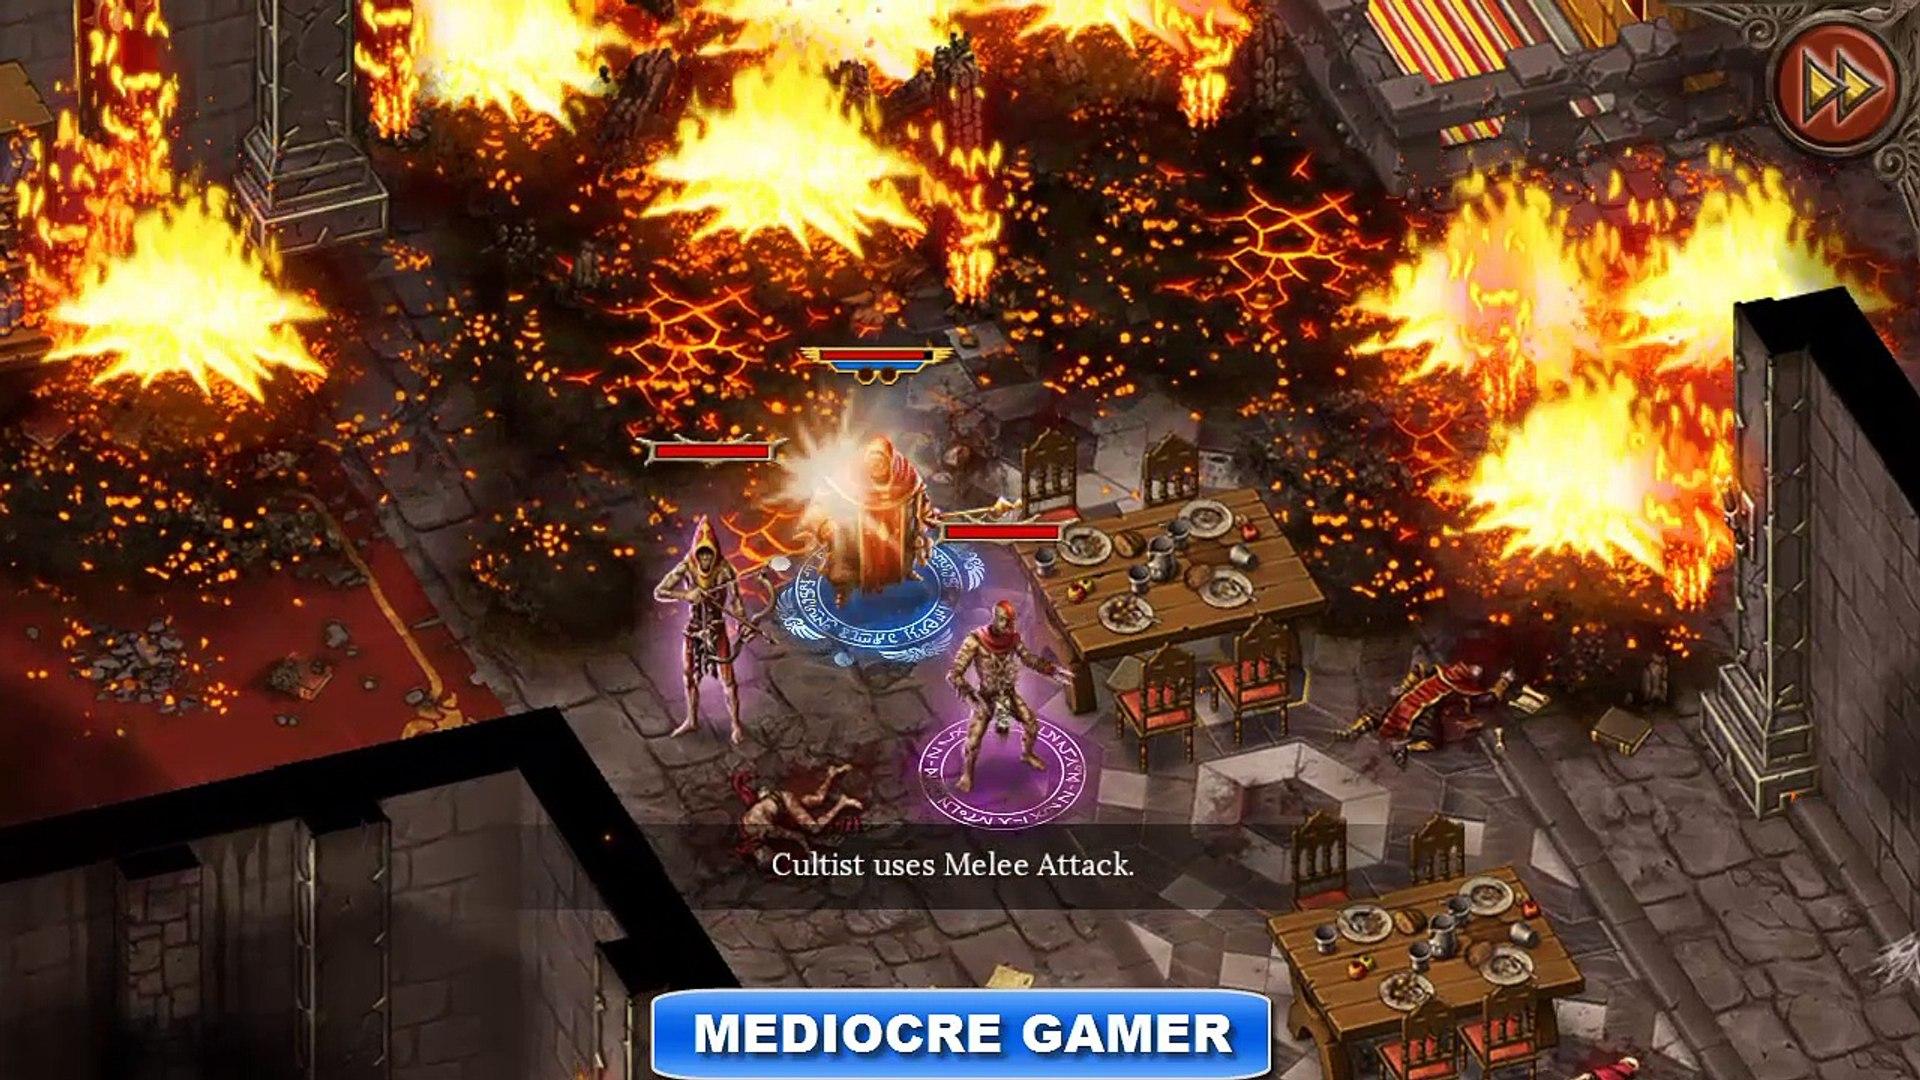 Devils and Demons Premium APK Download, Walkthrough 2, Super Mod n Hack Money